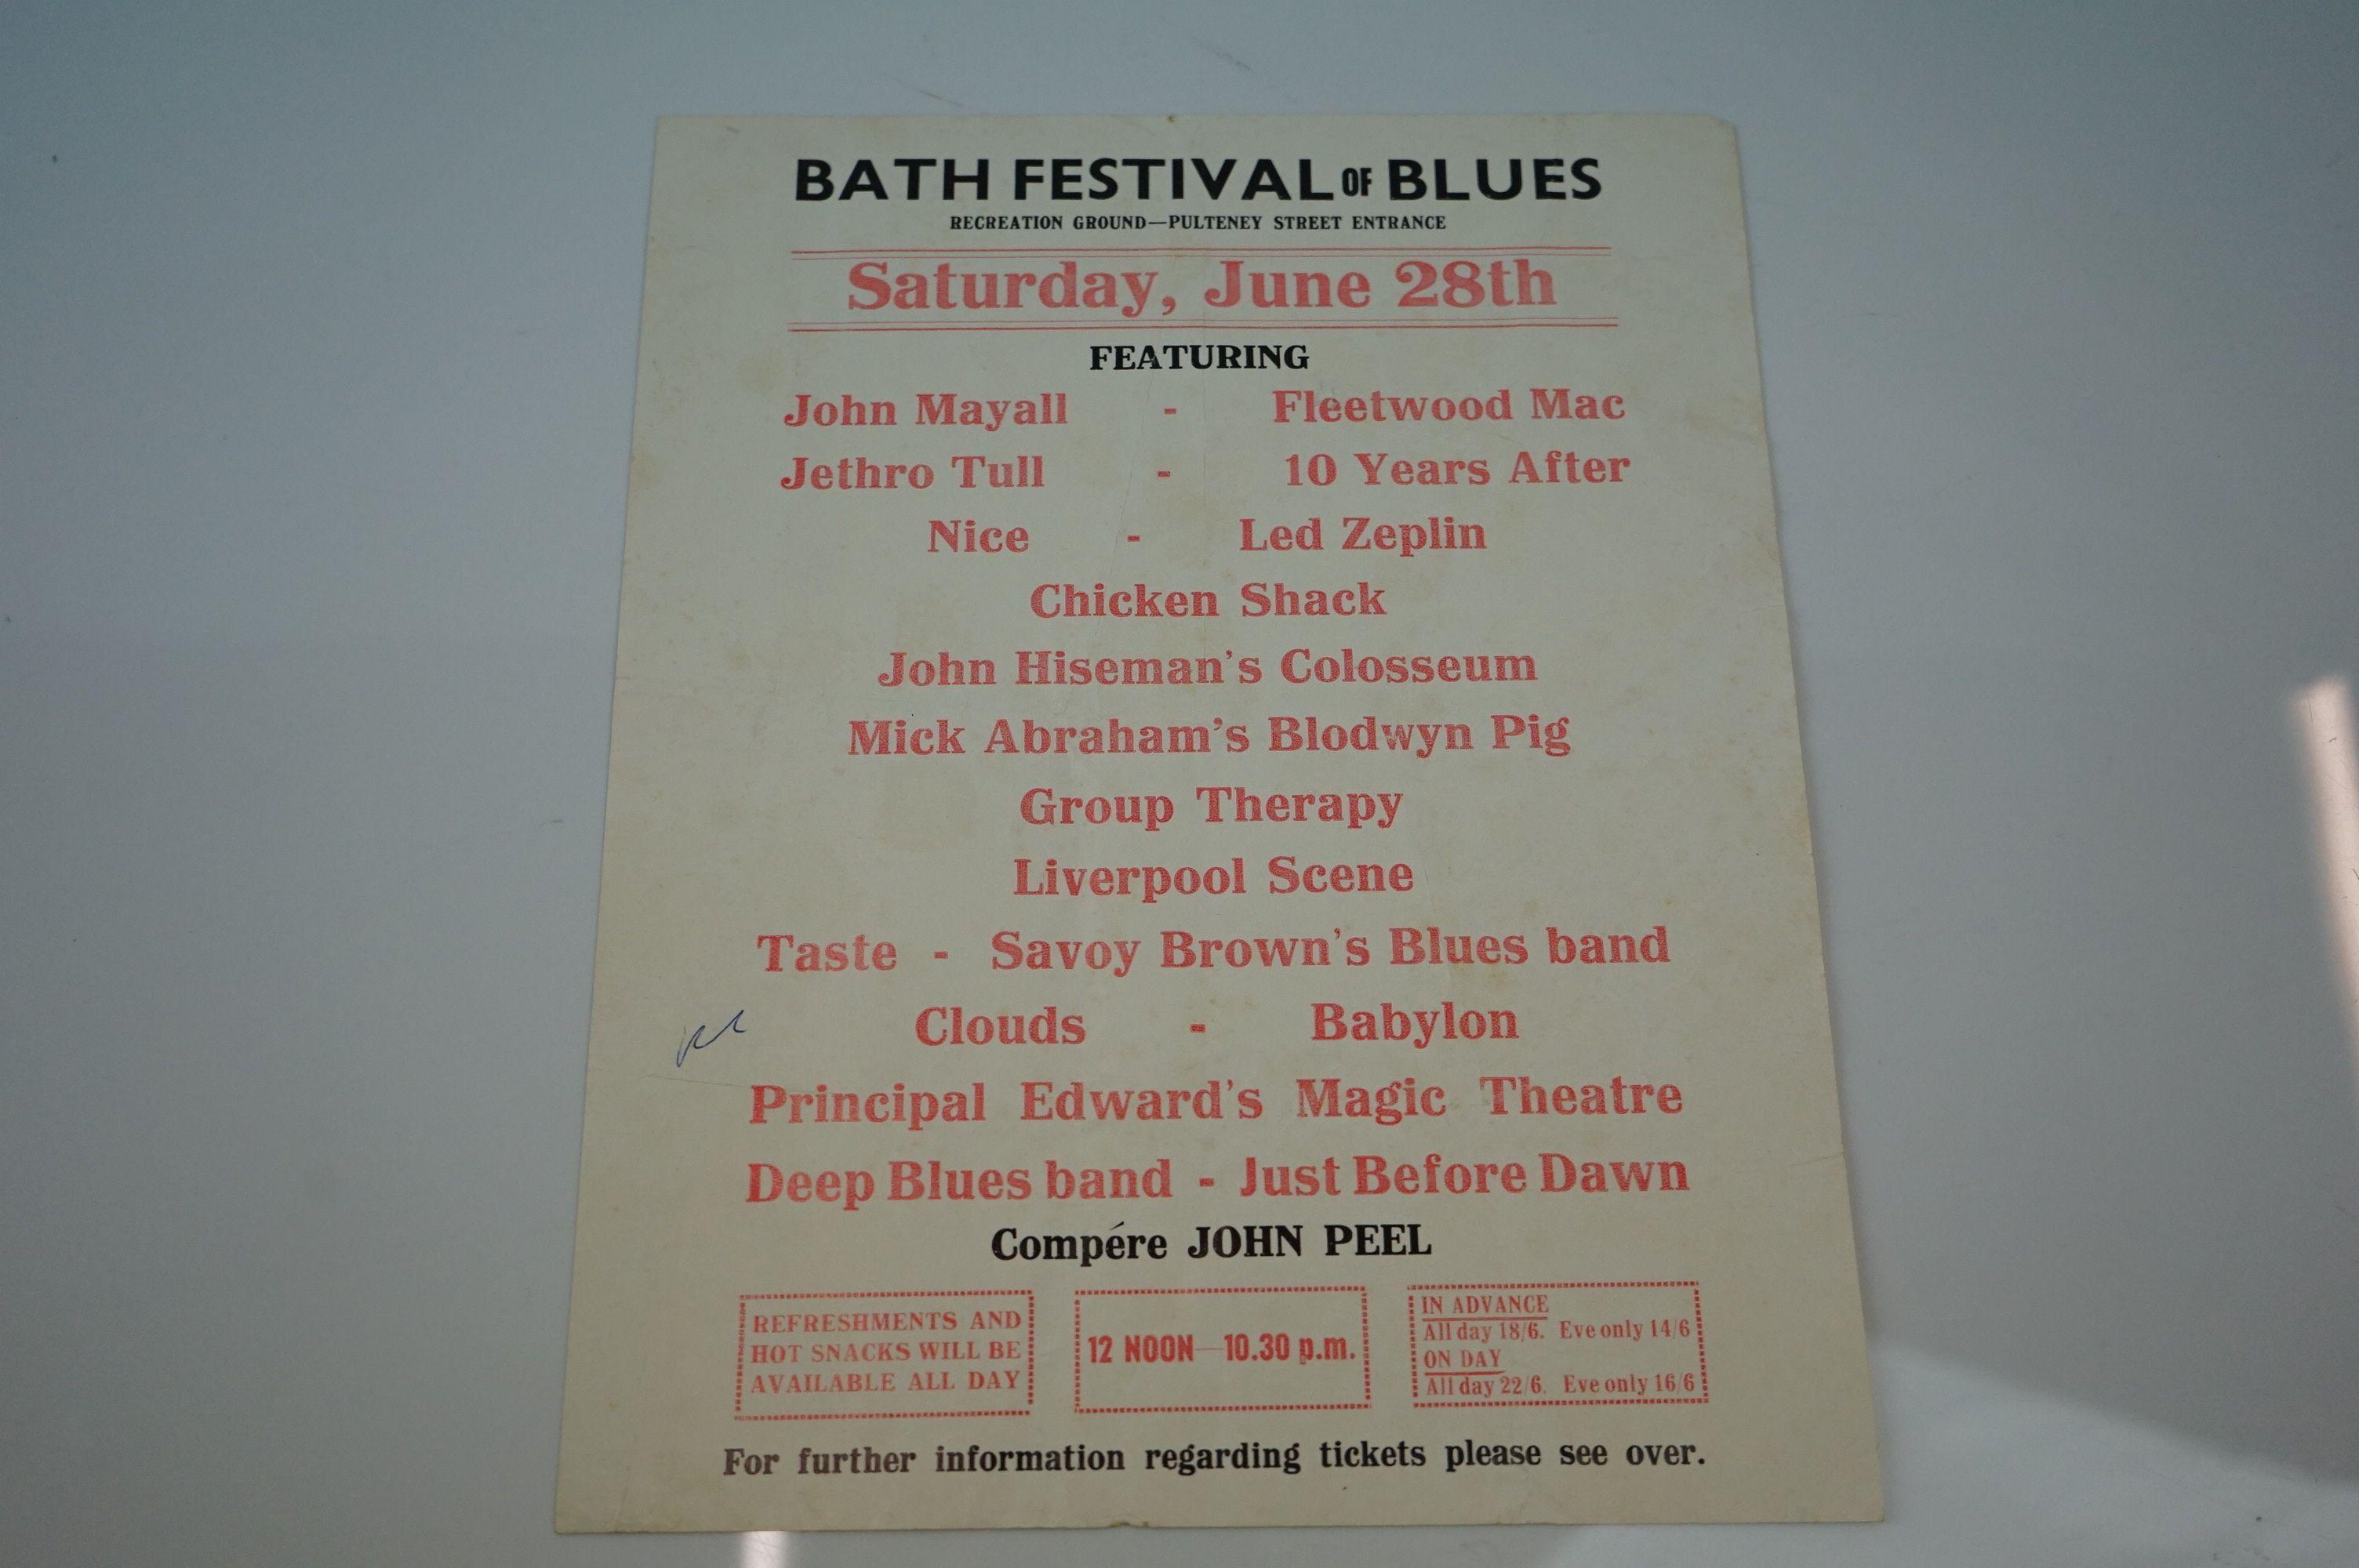 Bath Festival of Blues Music Poster / Flyer featuring John Mayall, Led Zeppelin, Fleetwood Mac, 10